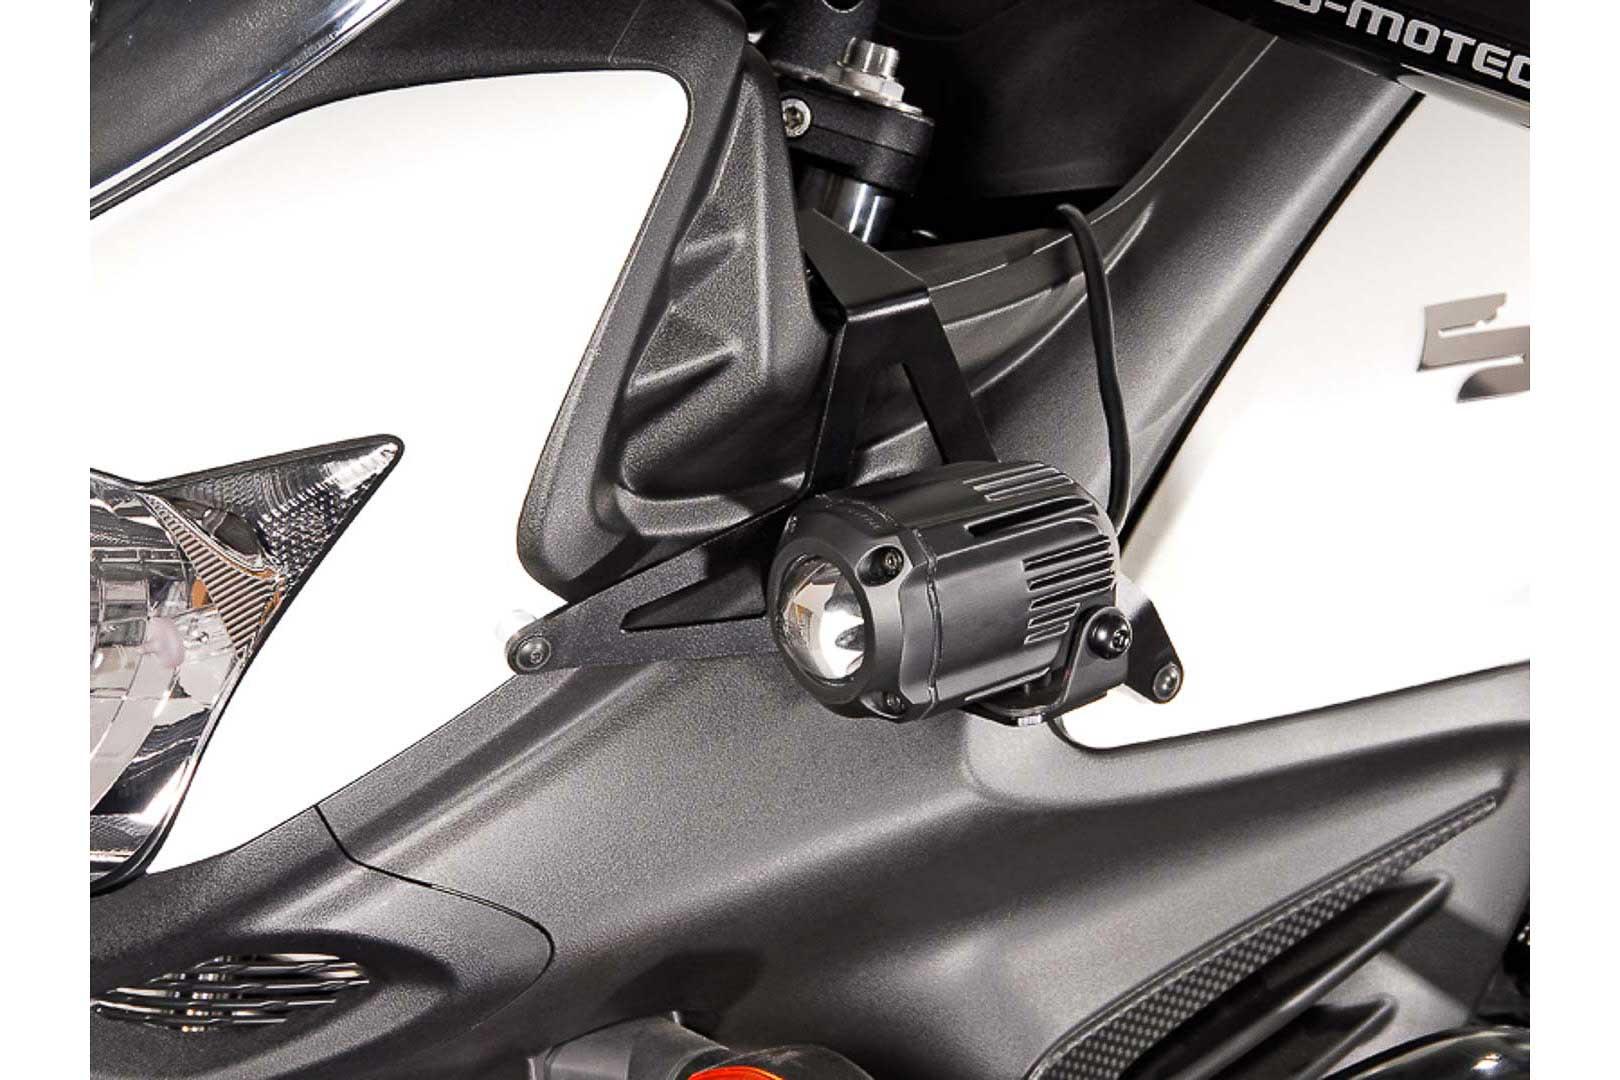 SW-Motech HAWK-lisävalosarjan kiinnike, Suzuki DL650 V-Strom 11-